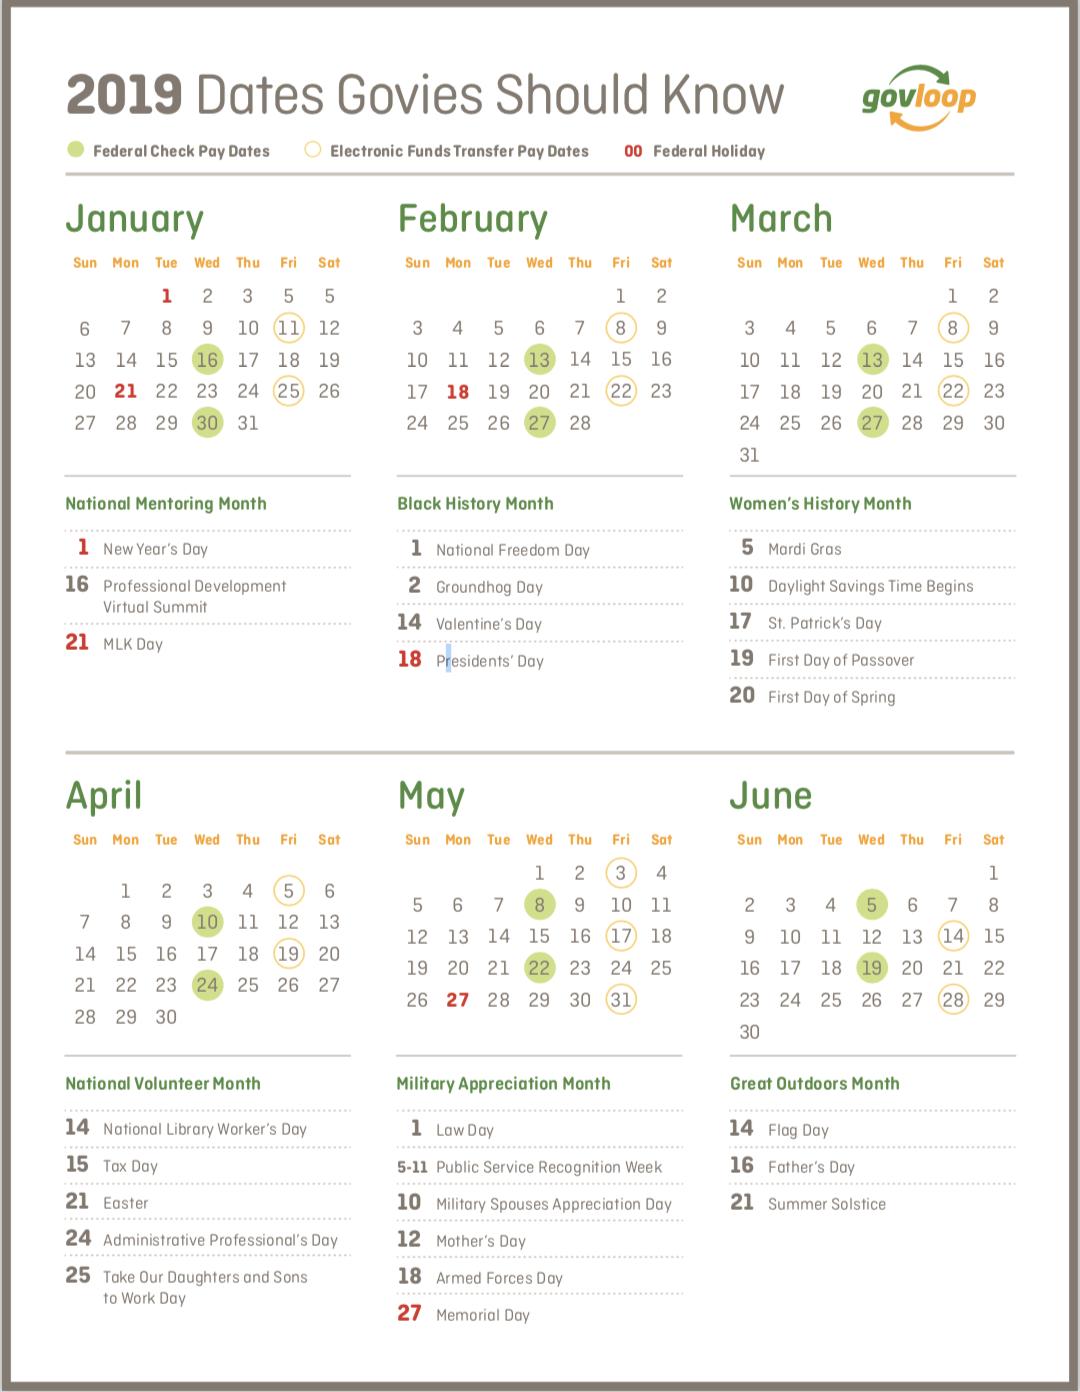 Federal Government Calendar 2019 2019 Dates Govies Should Know » Resources | GovLoop